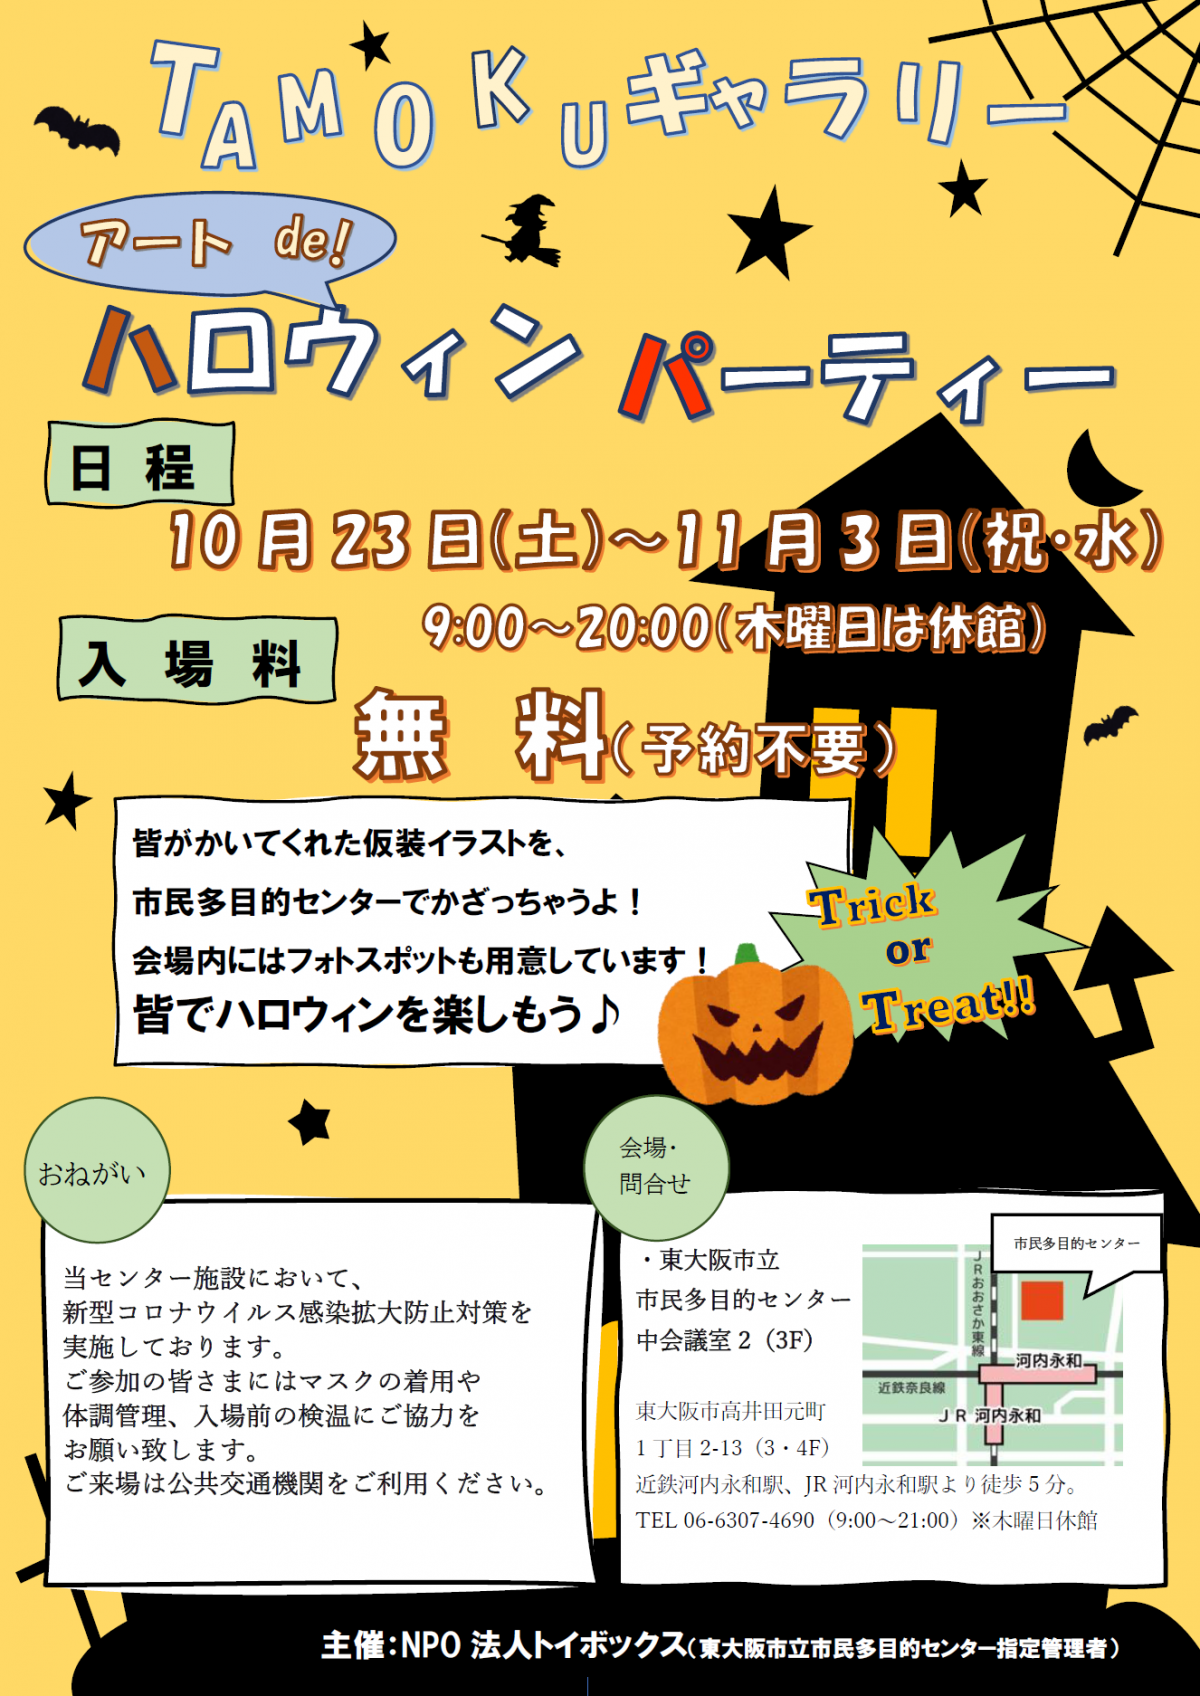 TAMOKUギャラリー アート de ハロウィンパーティー開催!!